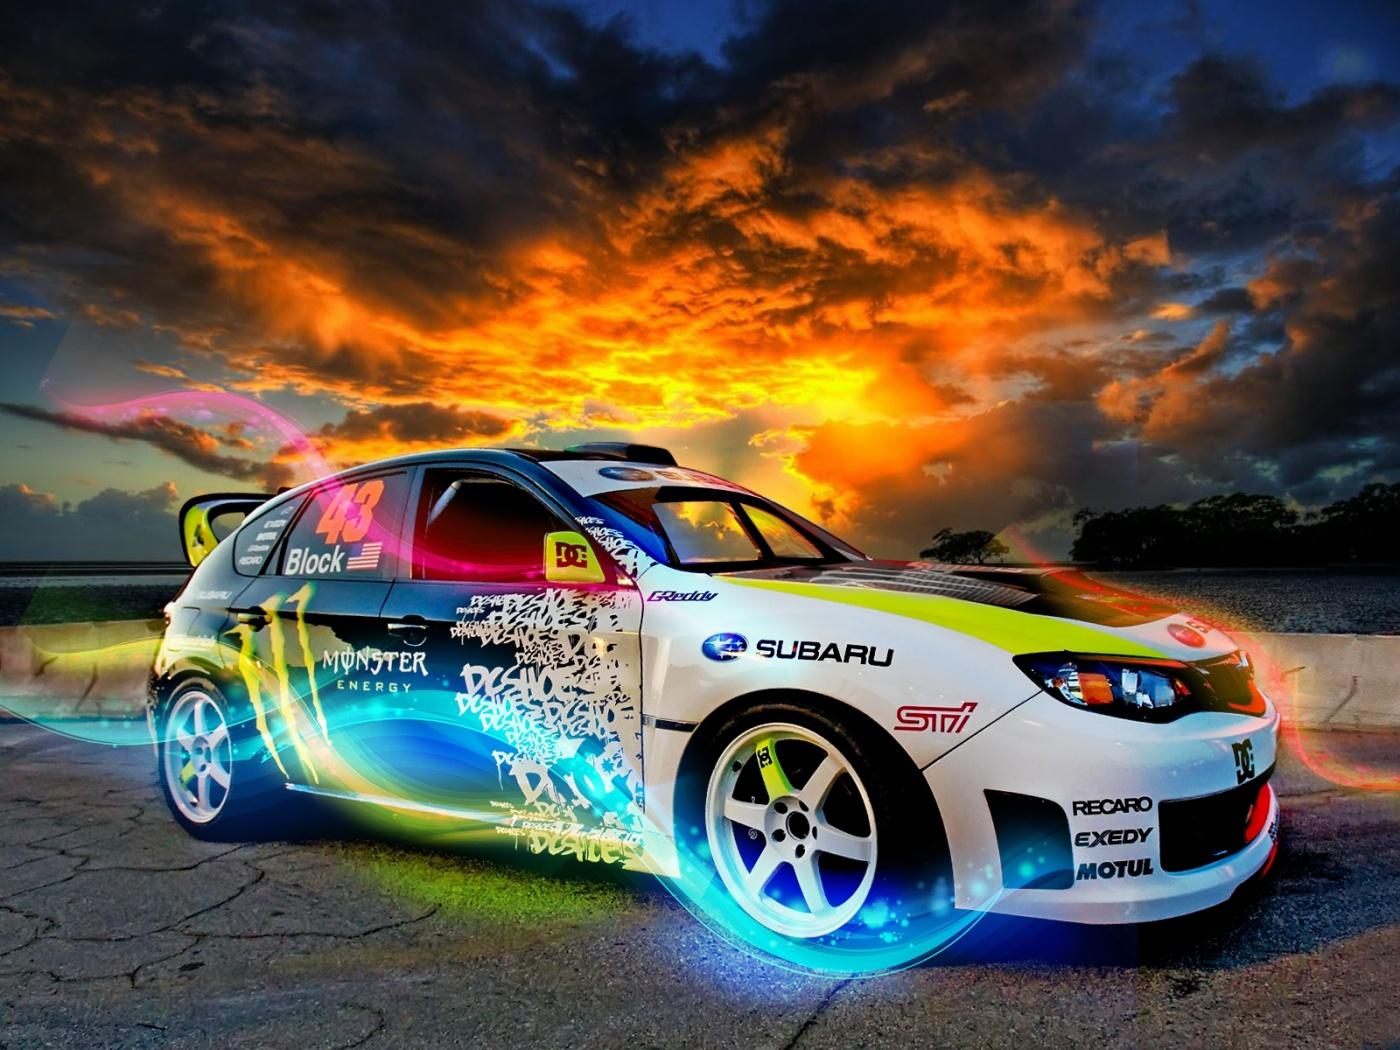 download Pimped Car Ken Block Subaru wallpaper desktop background 1400x1050